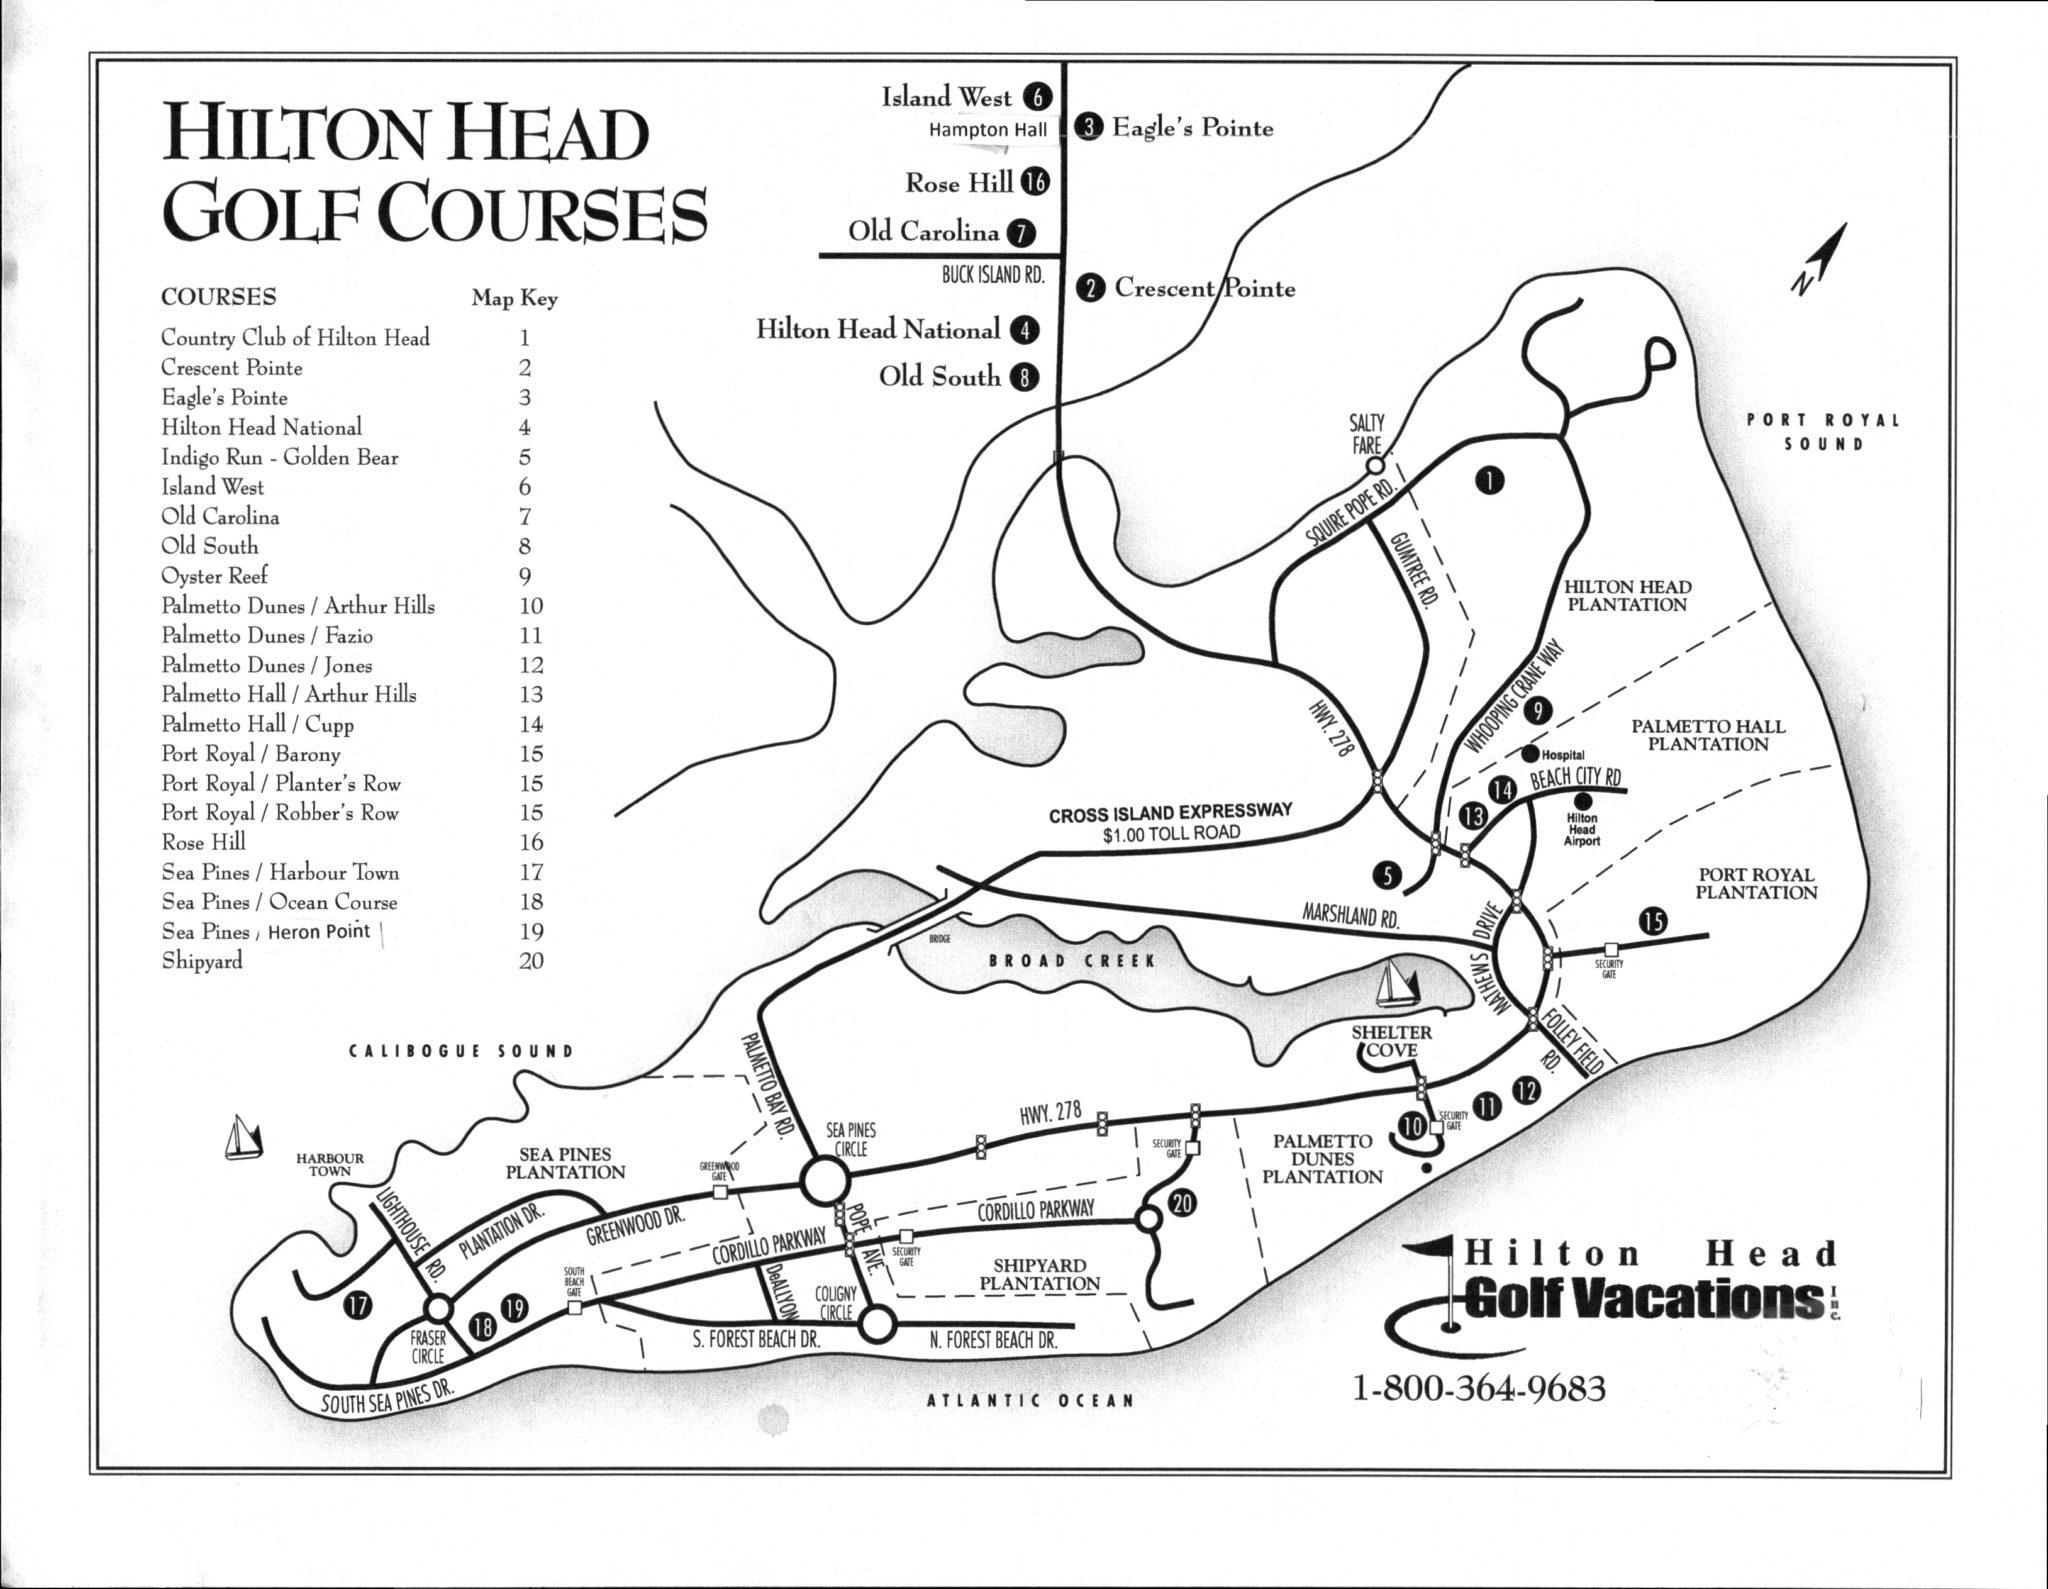 Golf Courses In South Carolina Map.Hilton Head Golf Course Map Hilton Head Golf Vacations